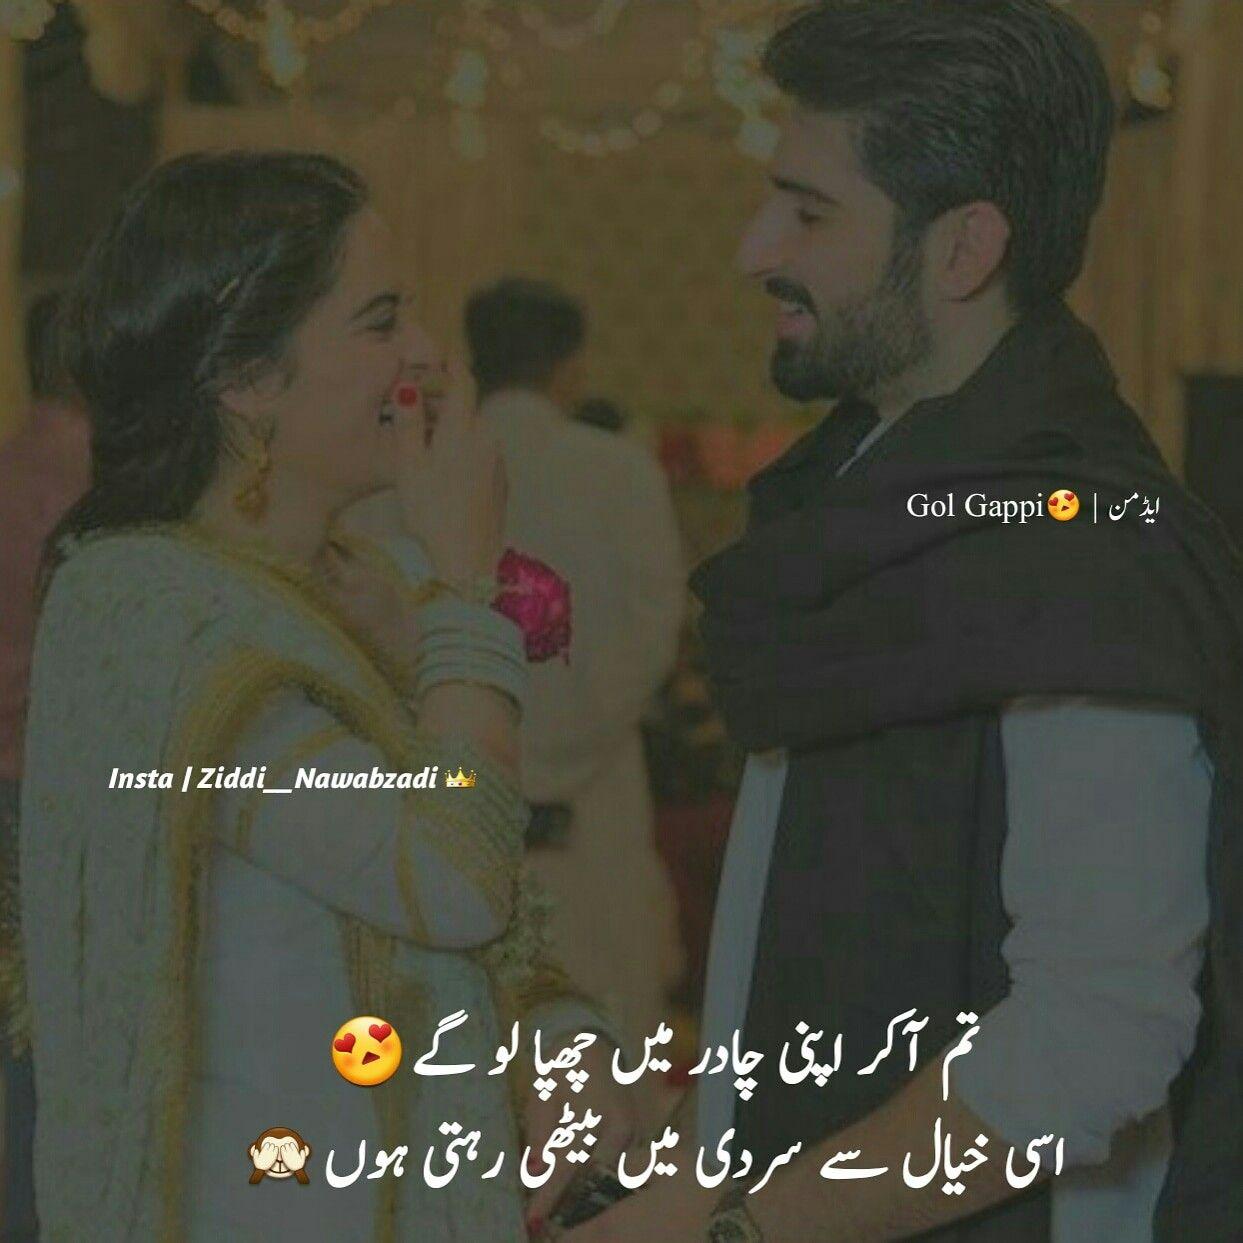 Funny Couple Quotes In Urdu